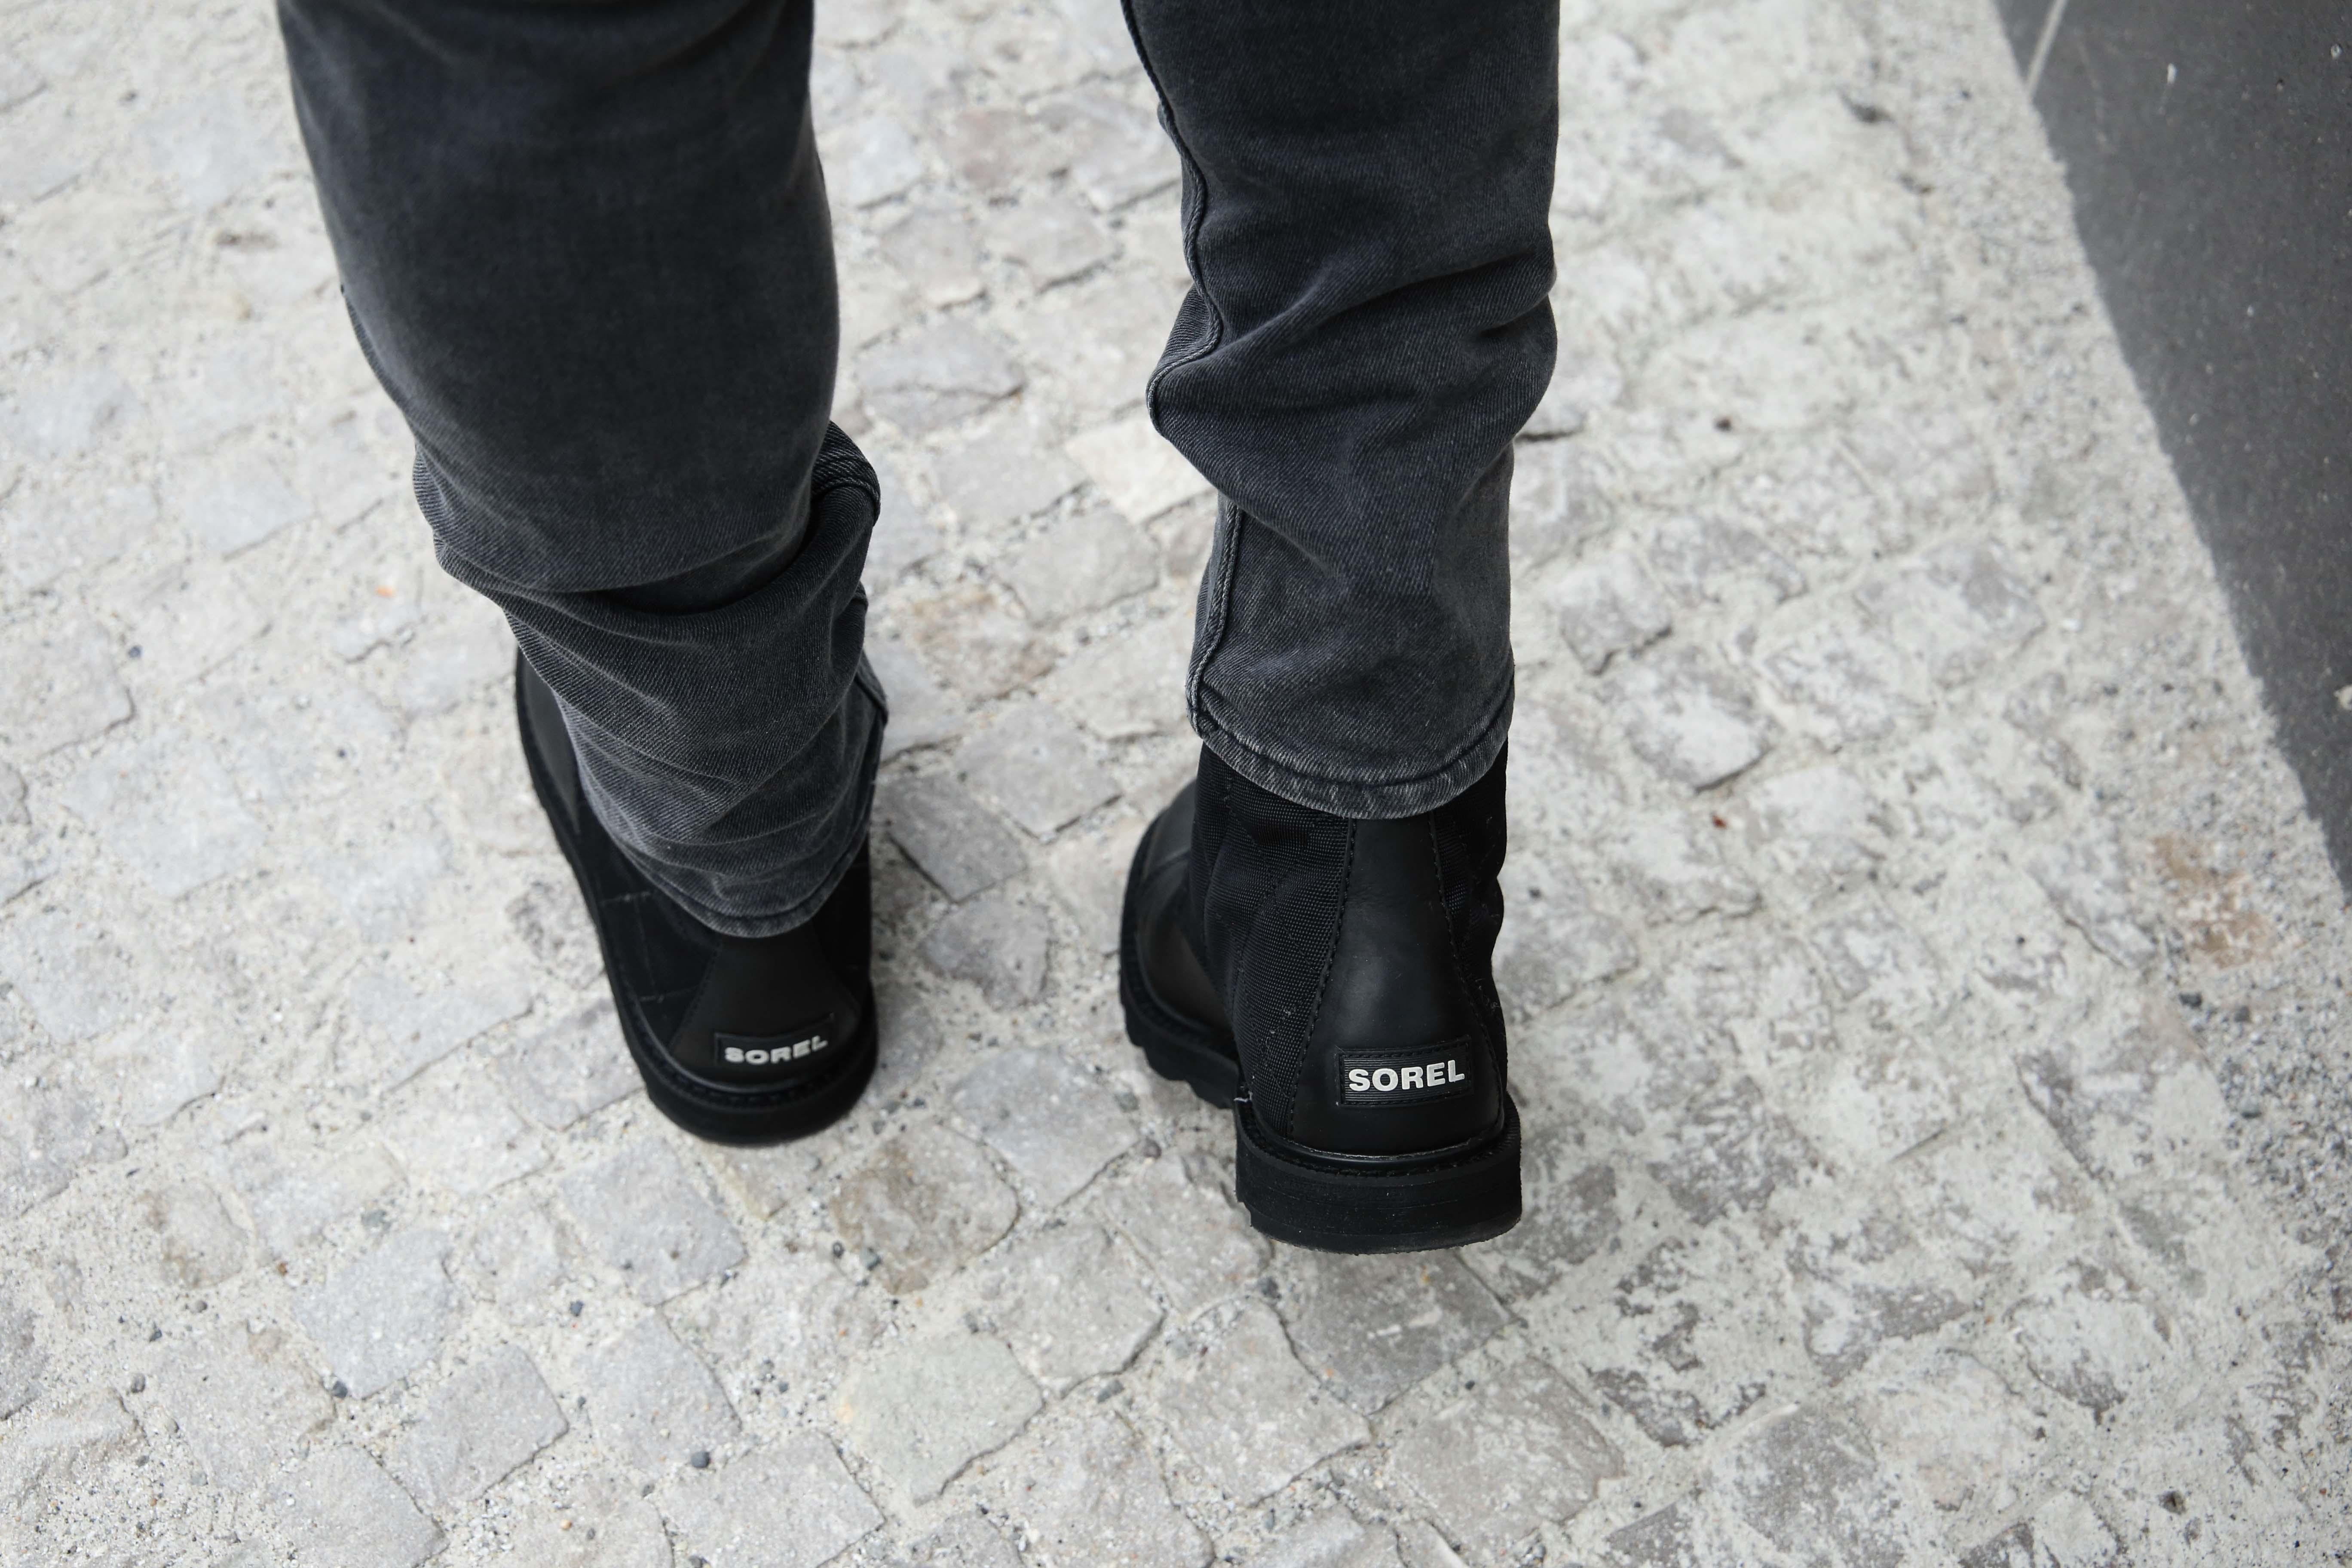 ashionblog-nike-logo-shirt-grüne-lederjacke-sorel-boots-männerblog-modeblog-berlin-blogger